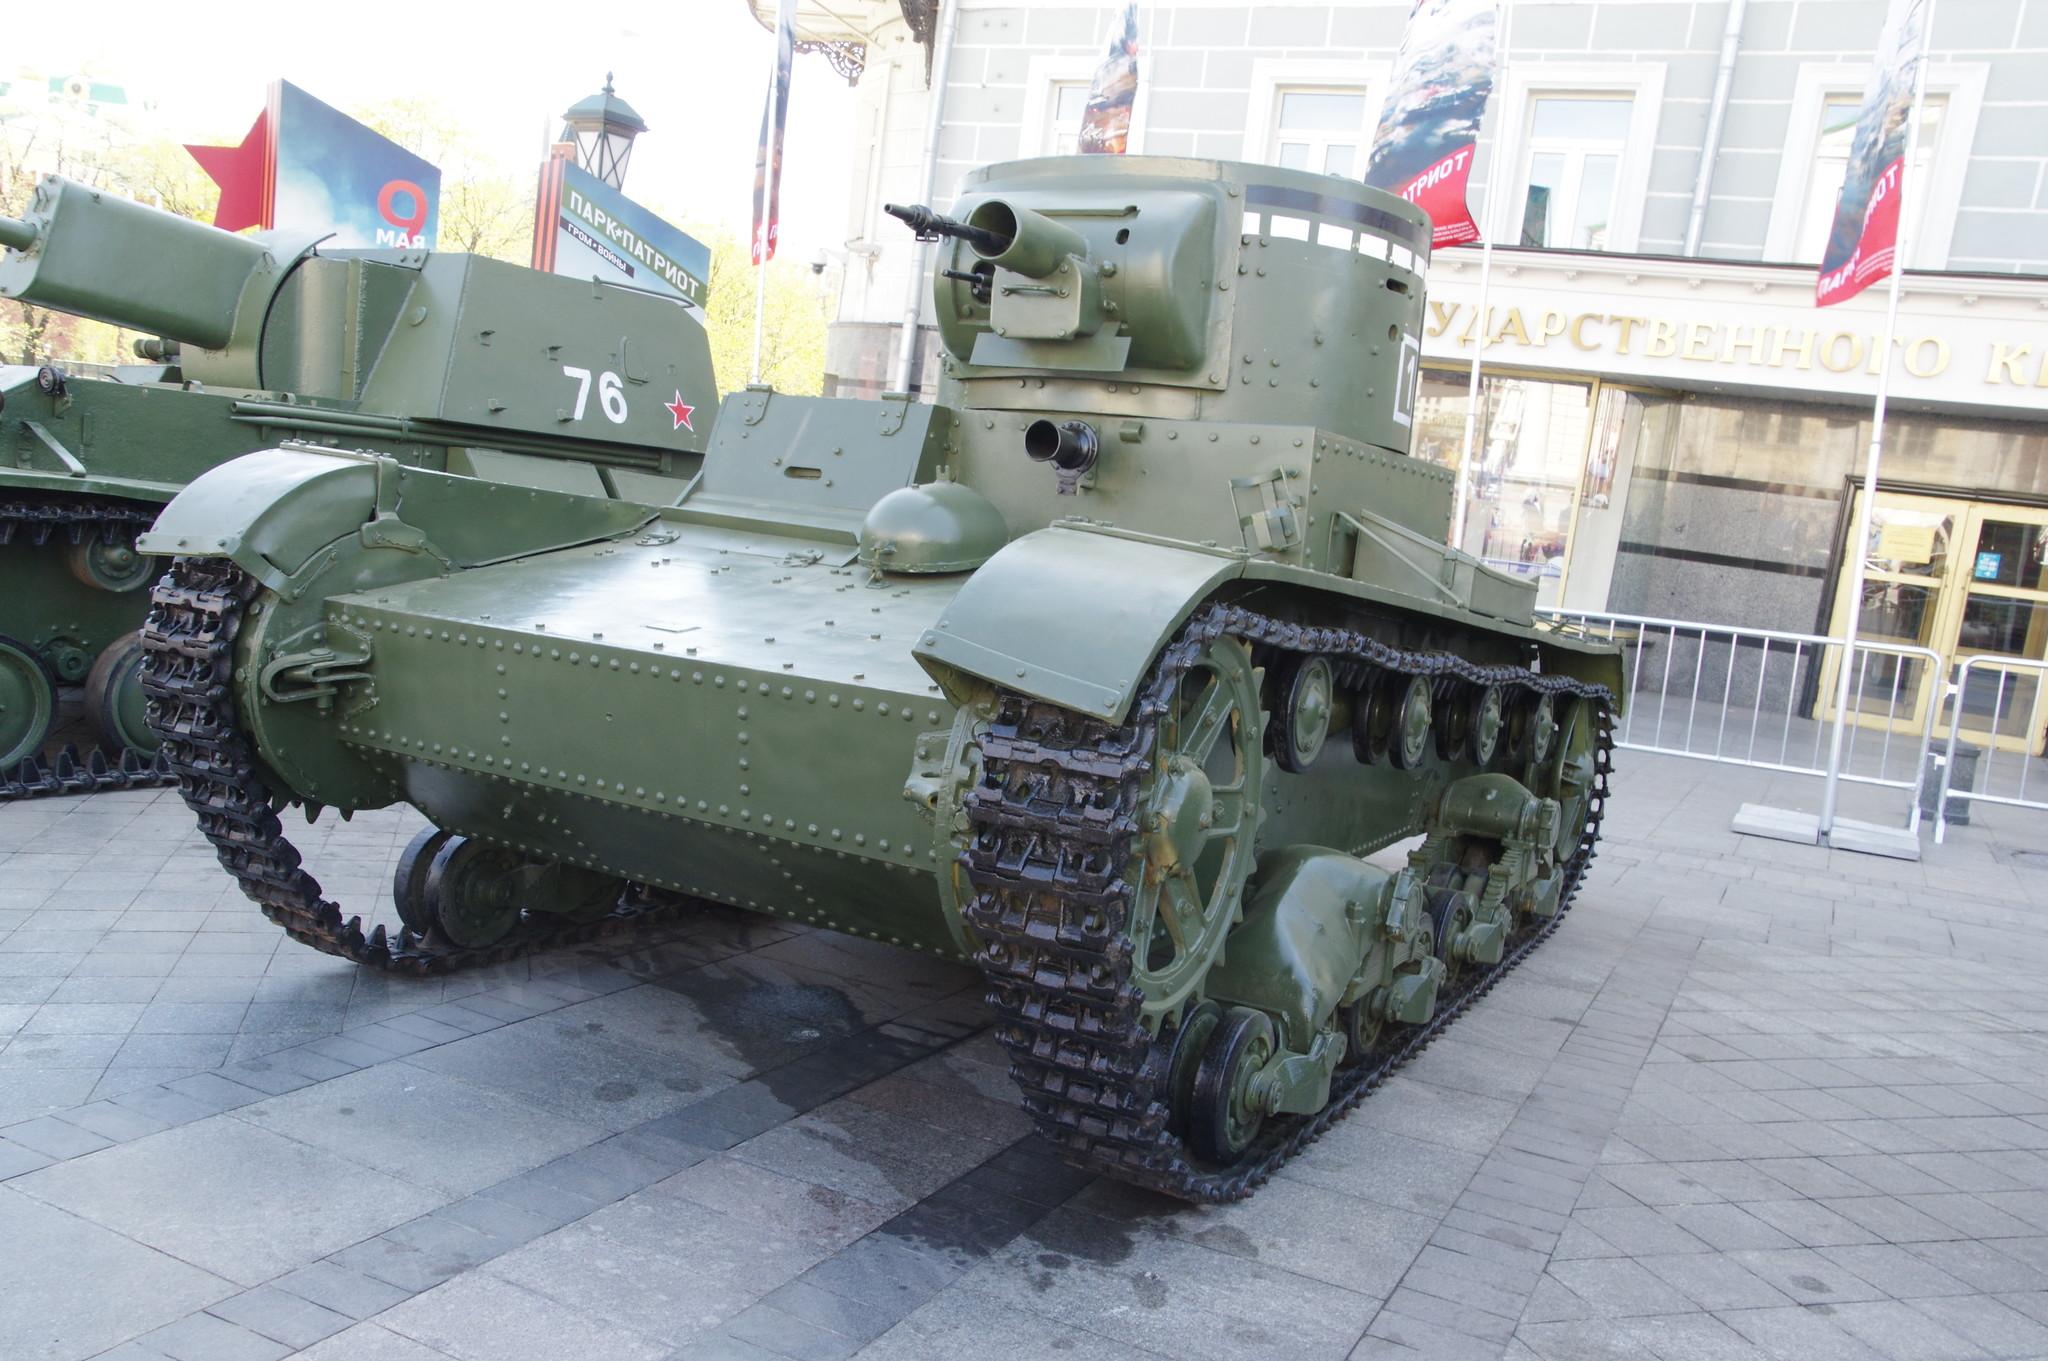 Огнемётный танк ОT-130 на базе танка Т-26